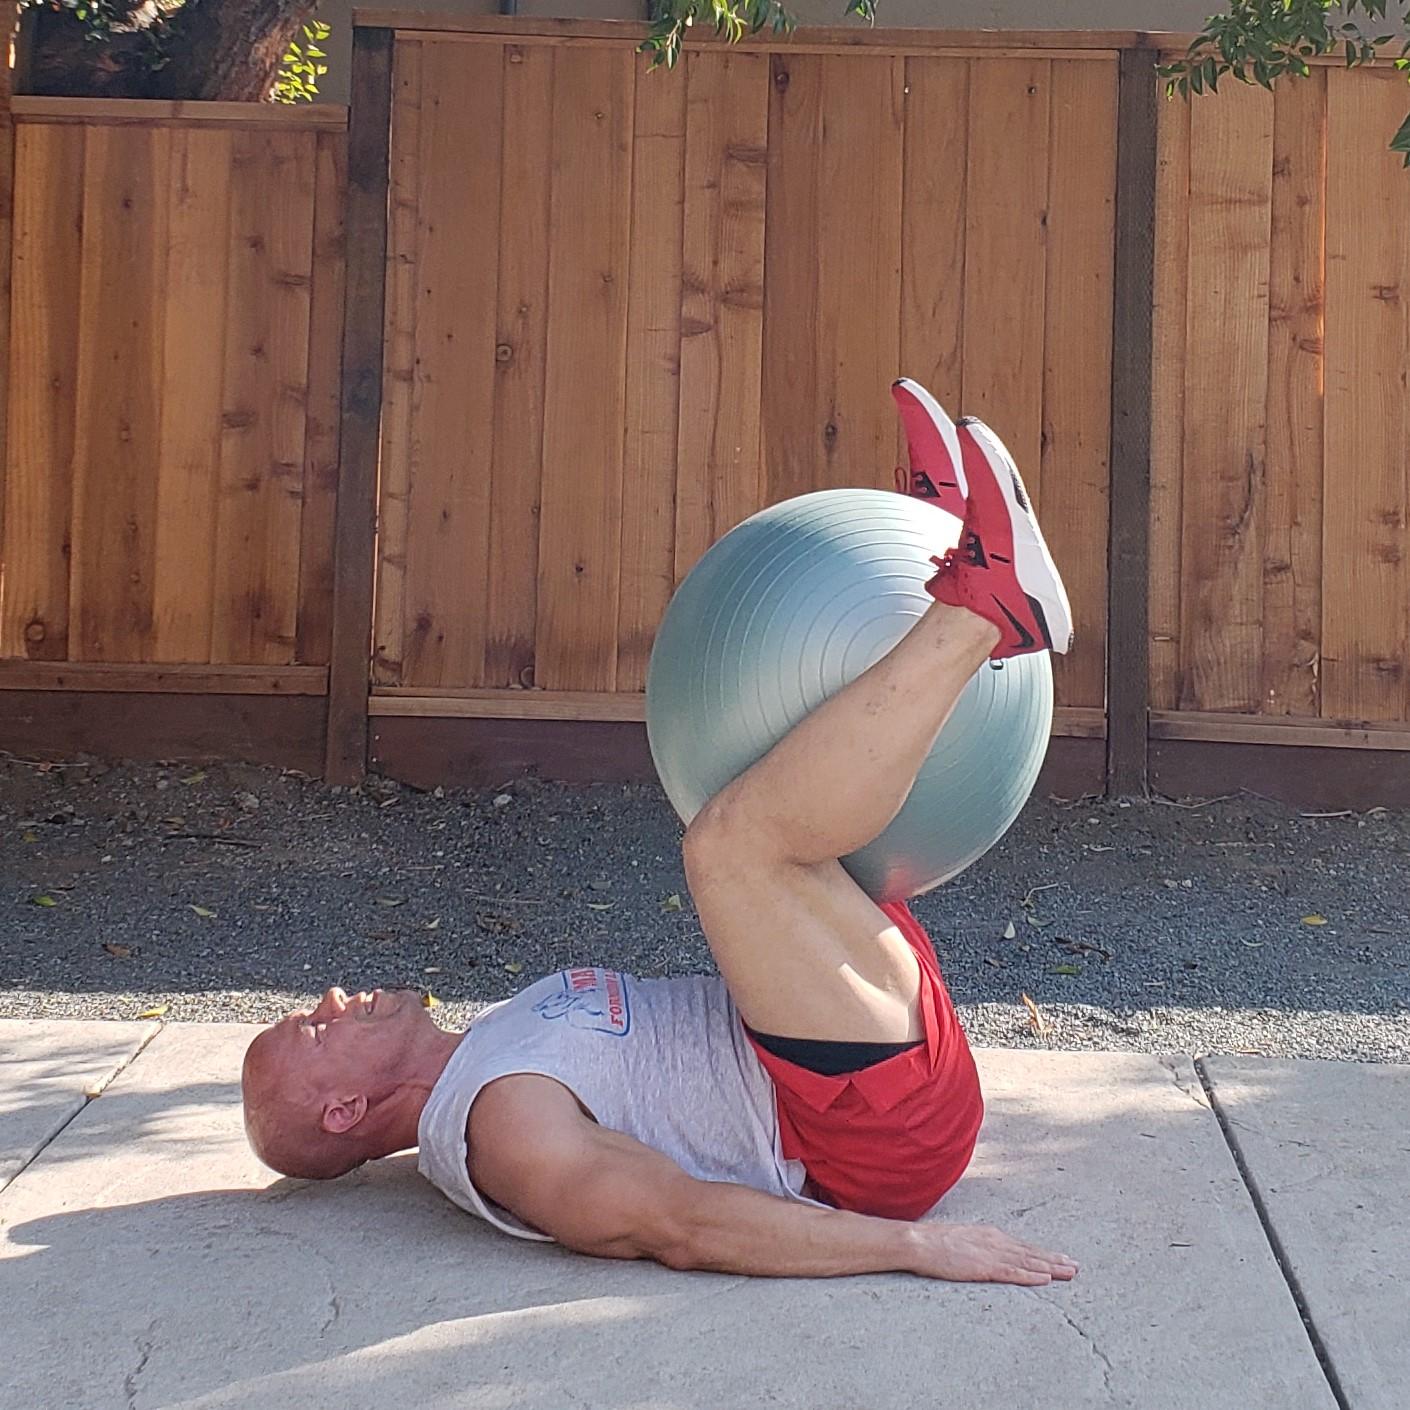 12 leg raises 15 x 15 x 15 Workouts For Older Men HOME Gym Workout #4